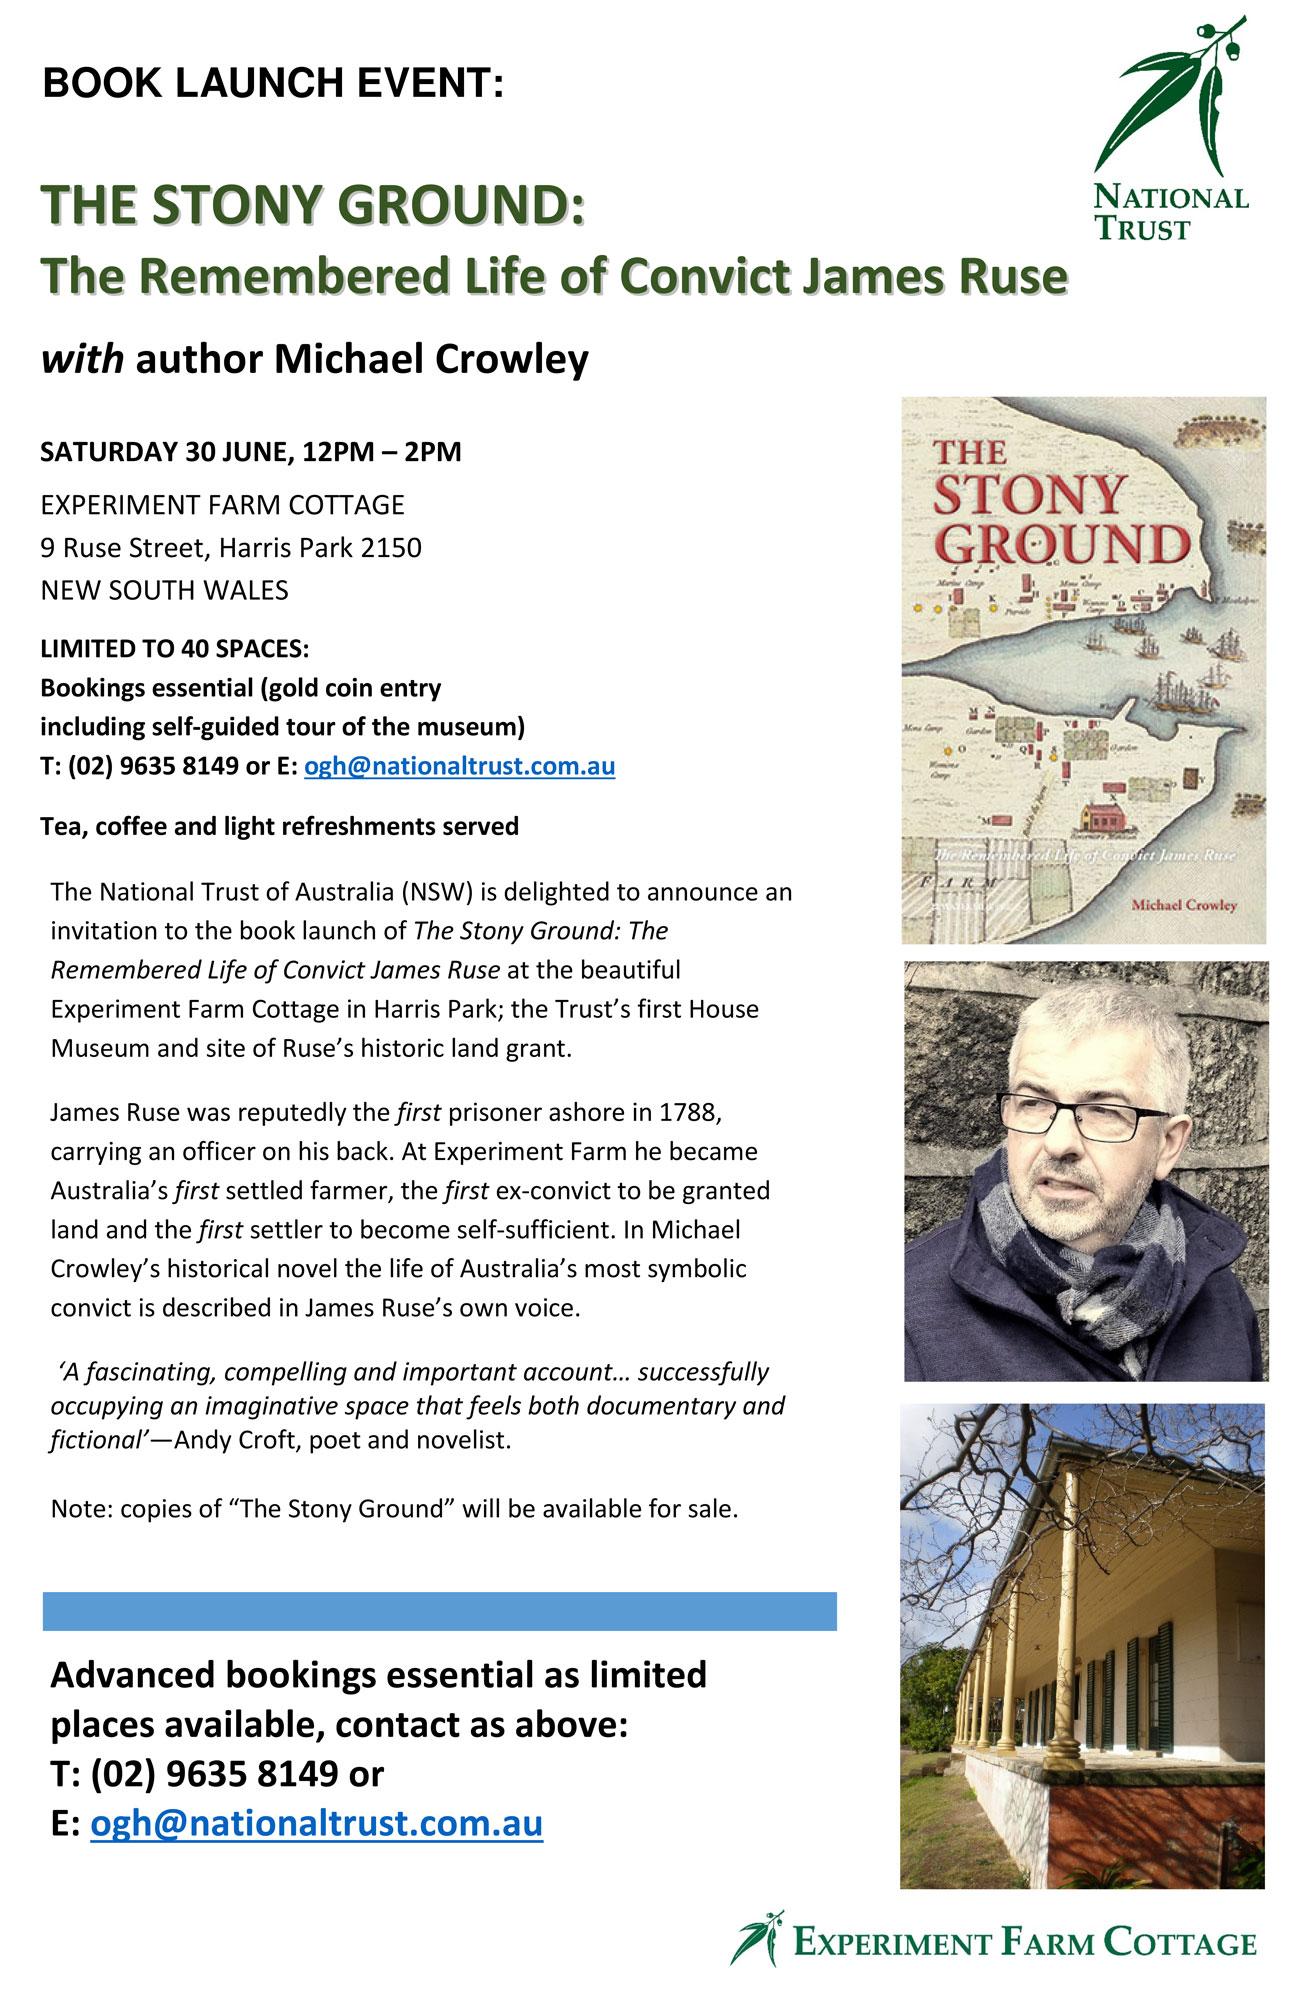 The-Stony-Ground-Invitation-30-June-2018-at-EFC